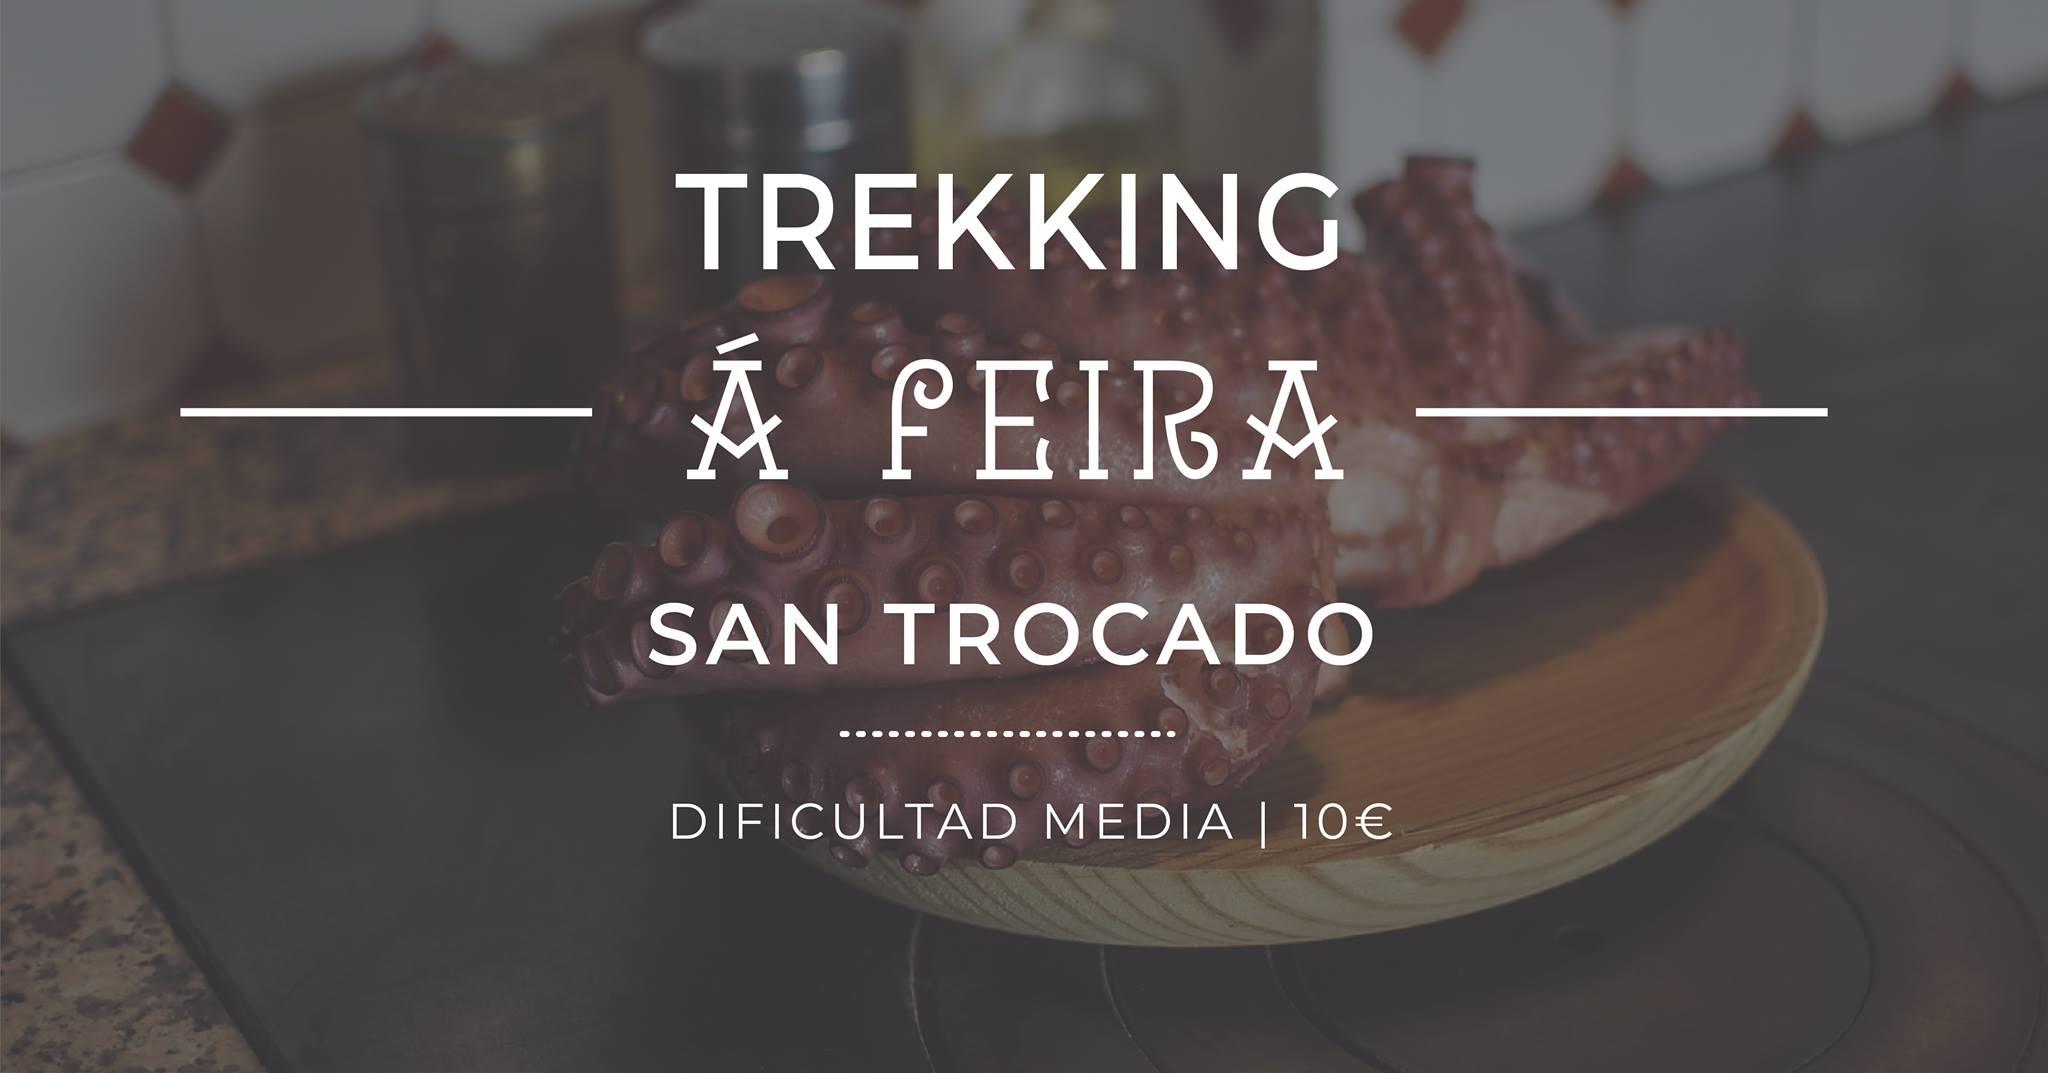 san-trocado-trekking-a-feira